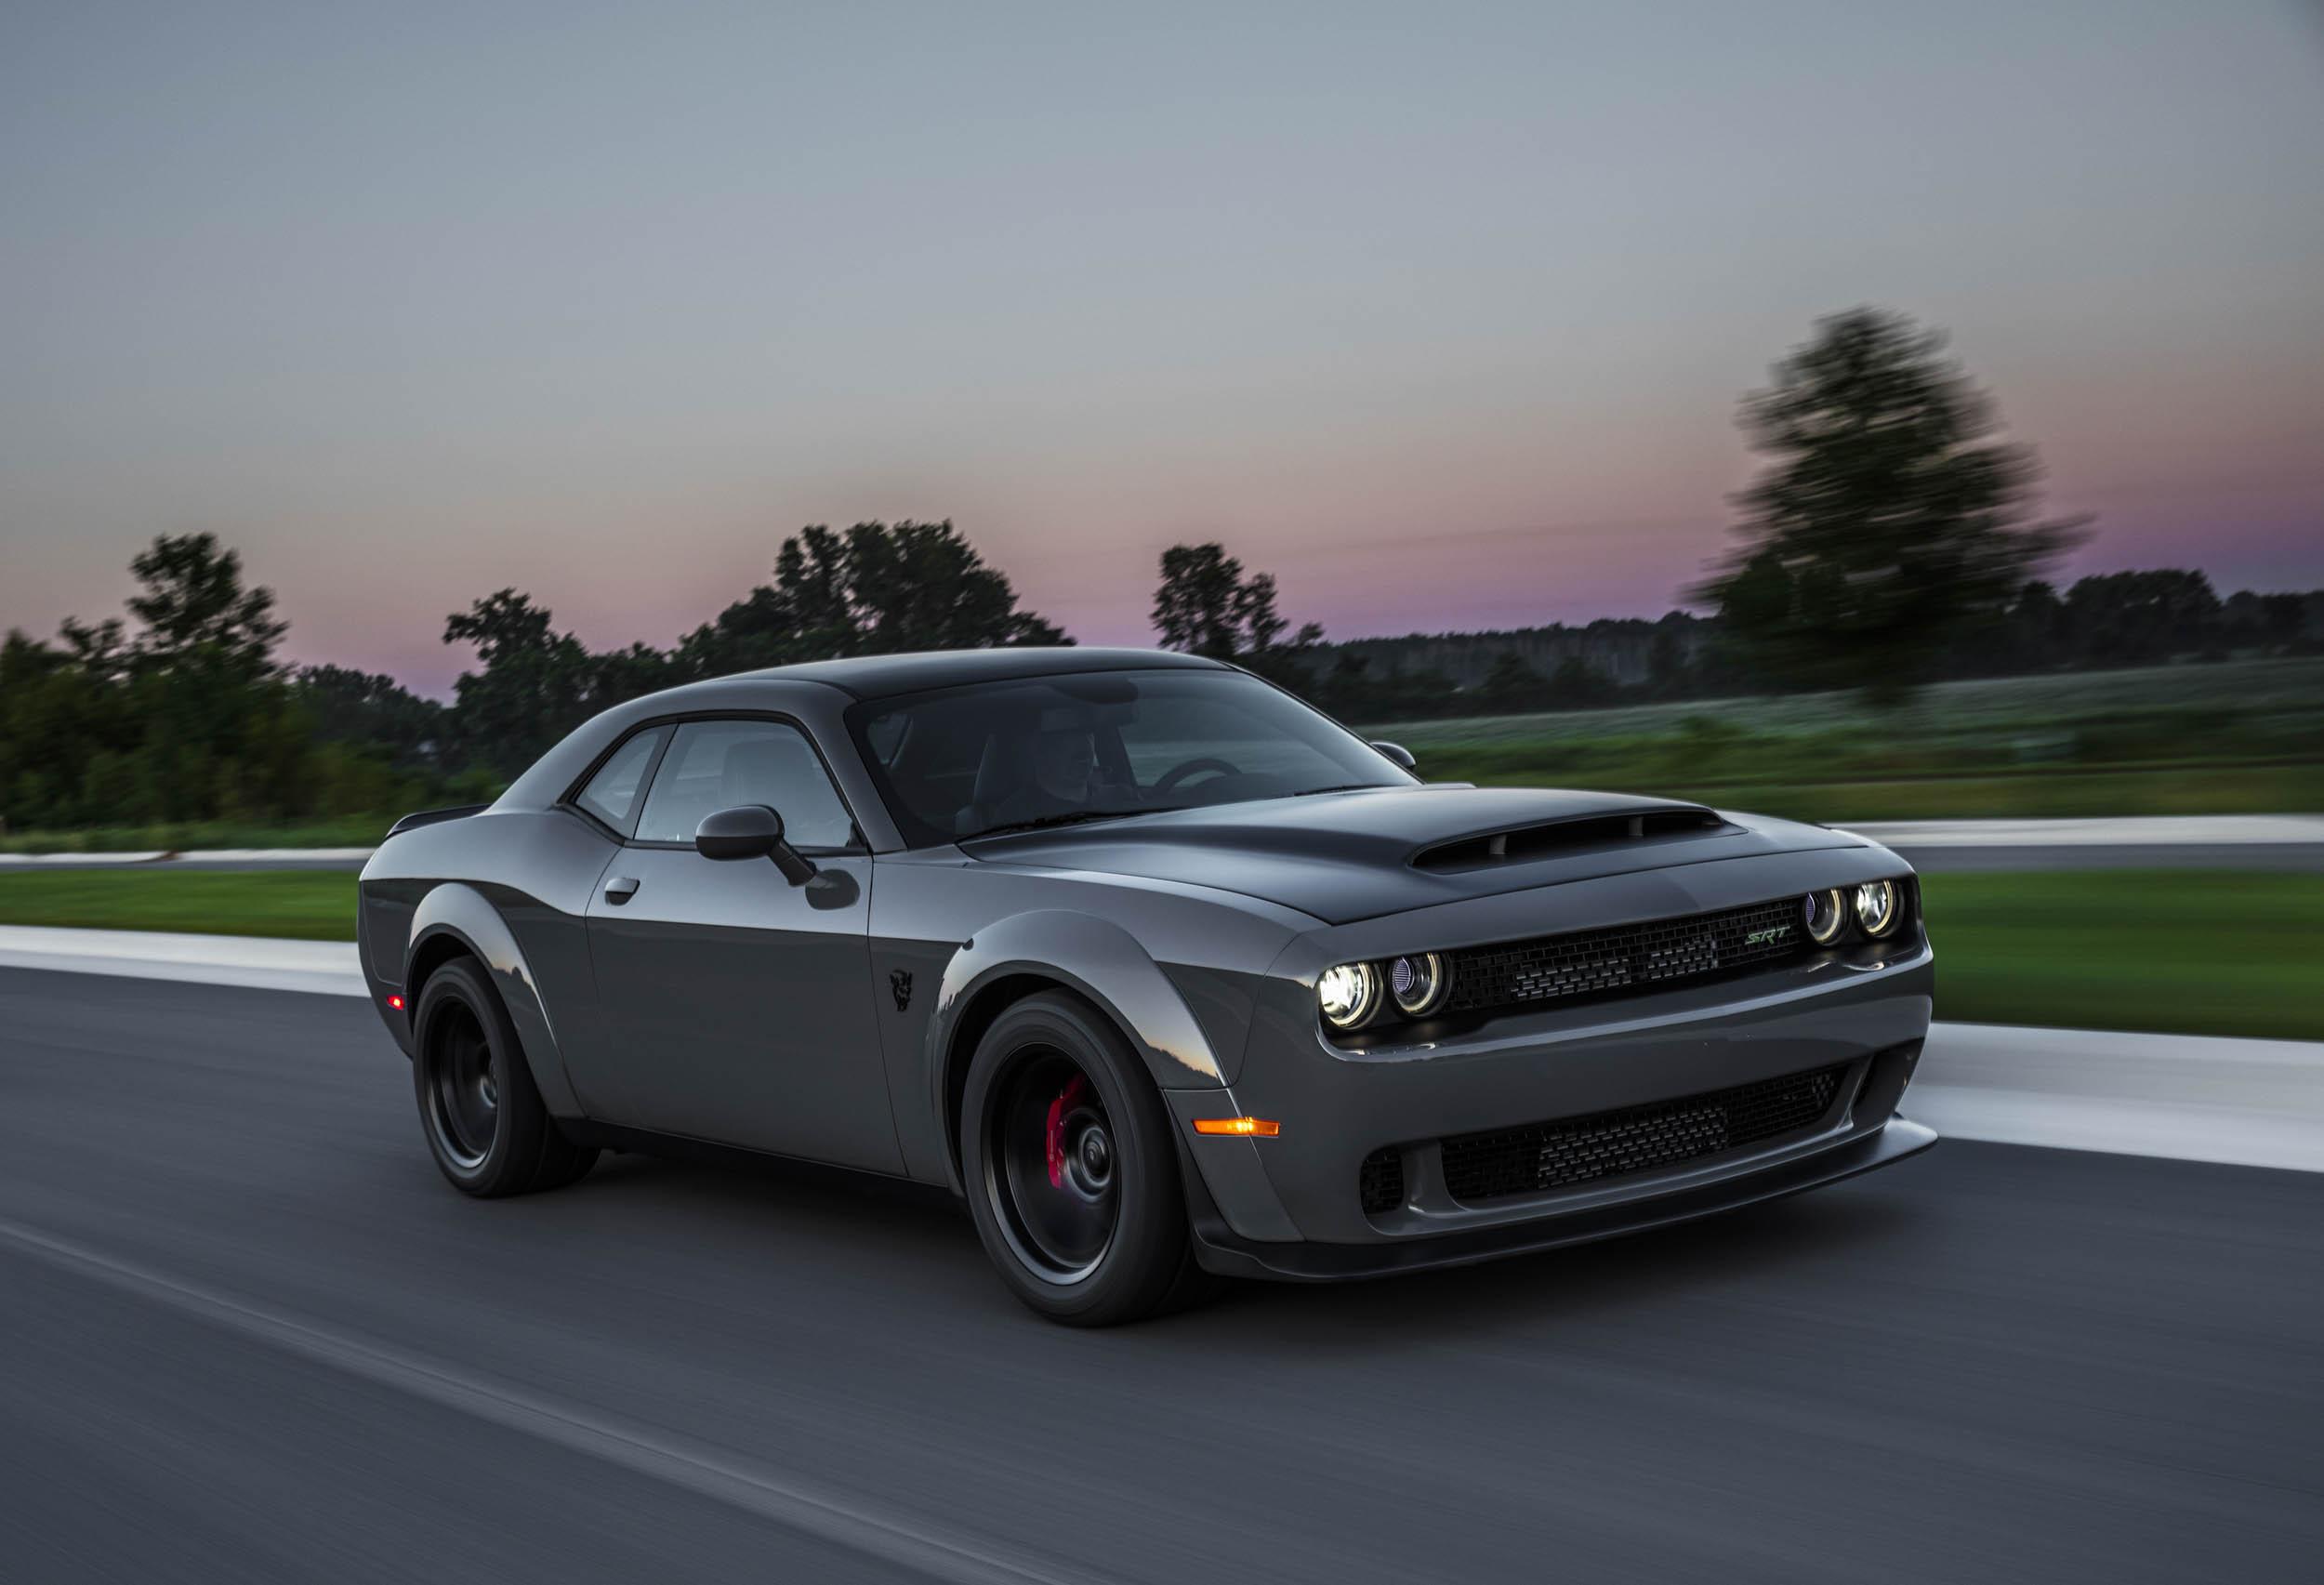 2018 Dodge Challenger SRT Demon front 3/4